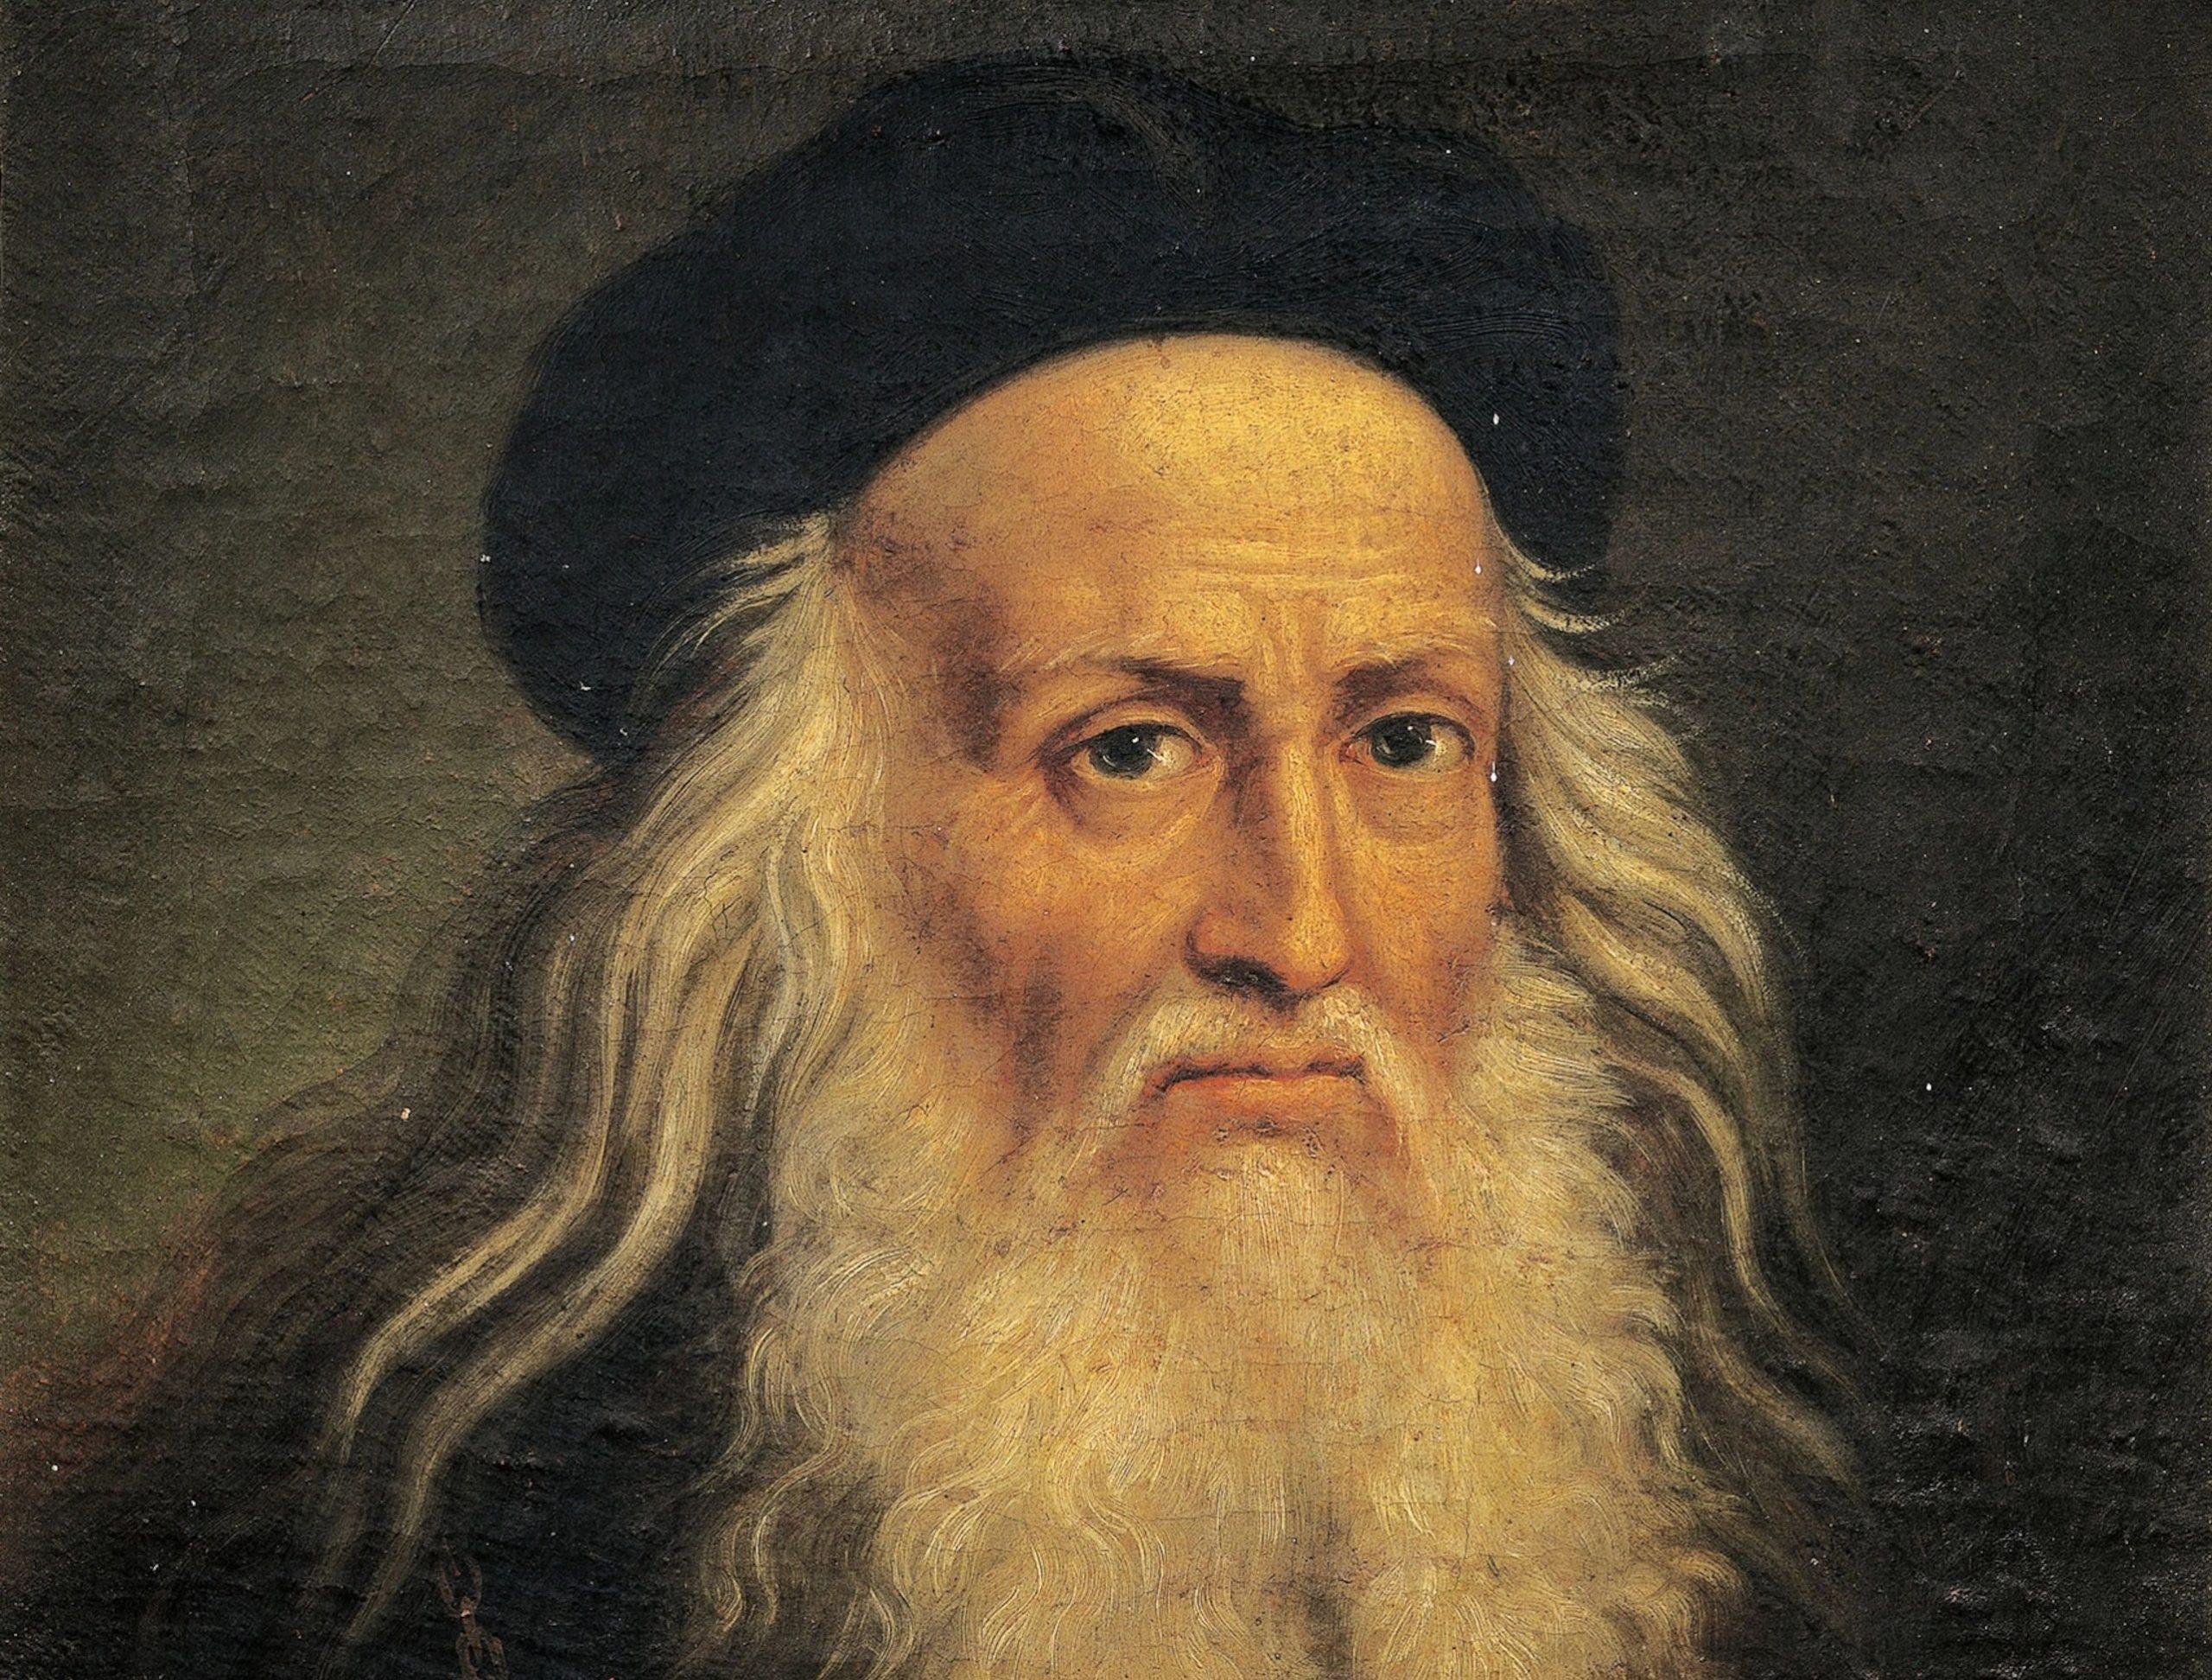 14 da Vinci family members identified